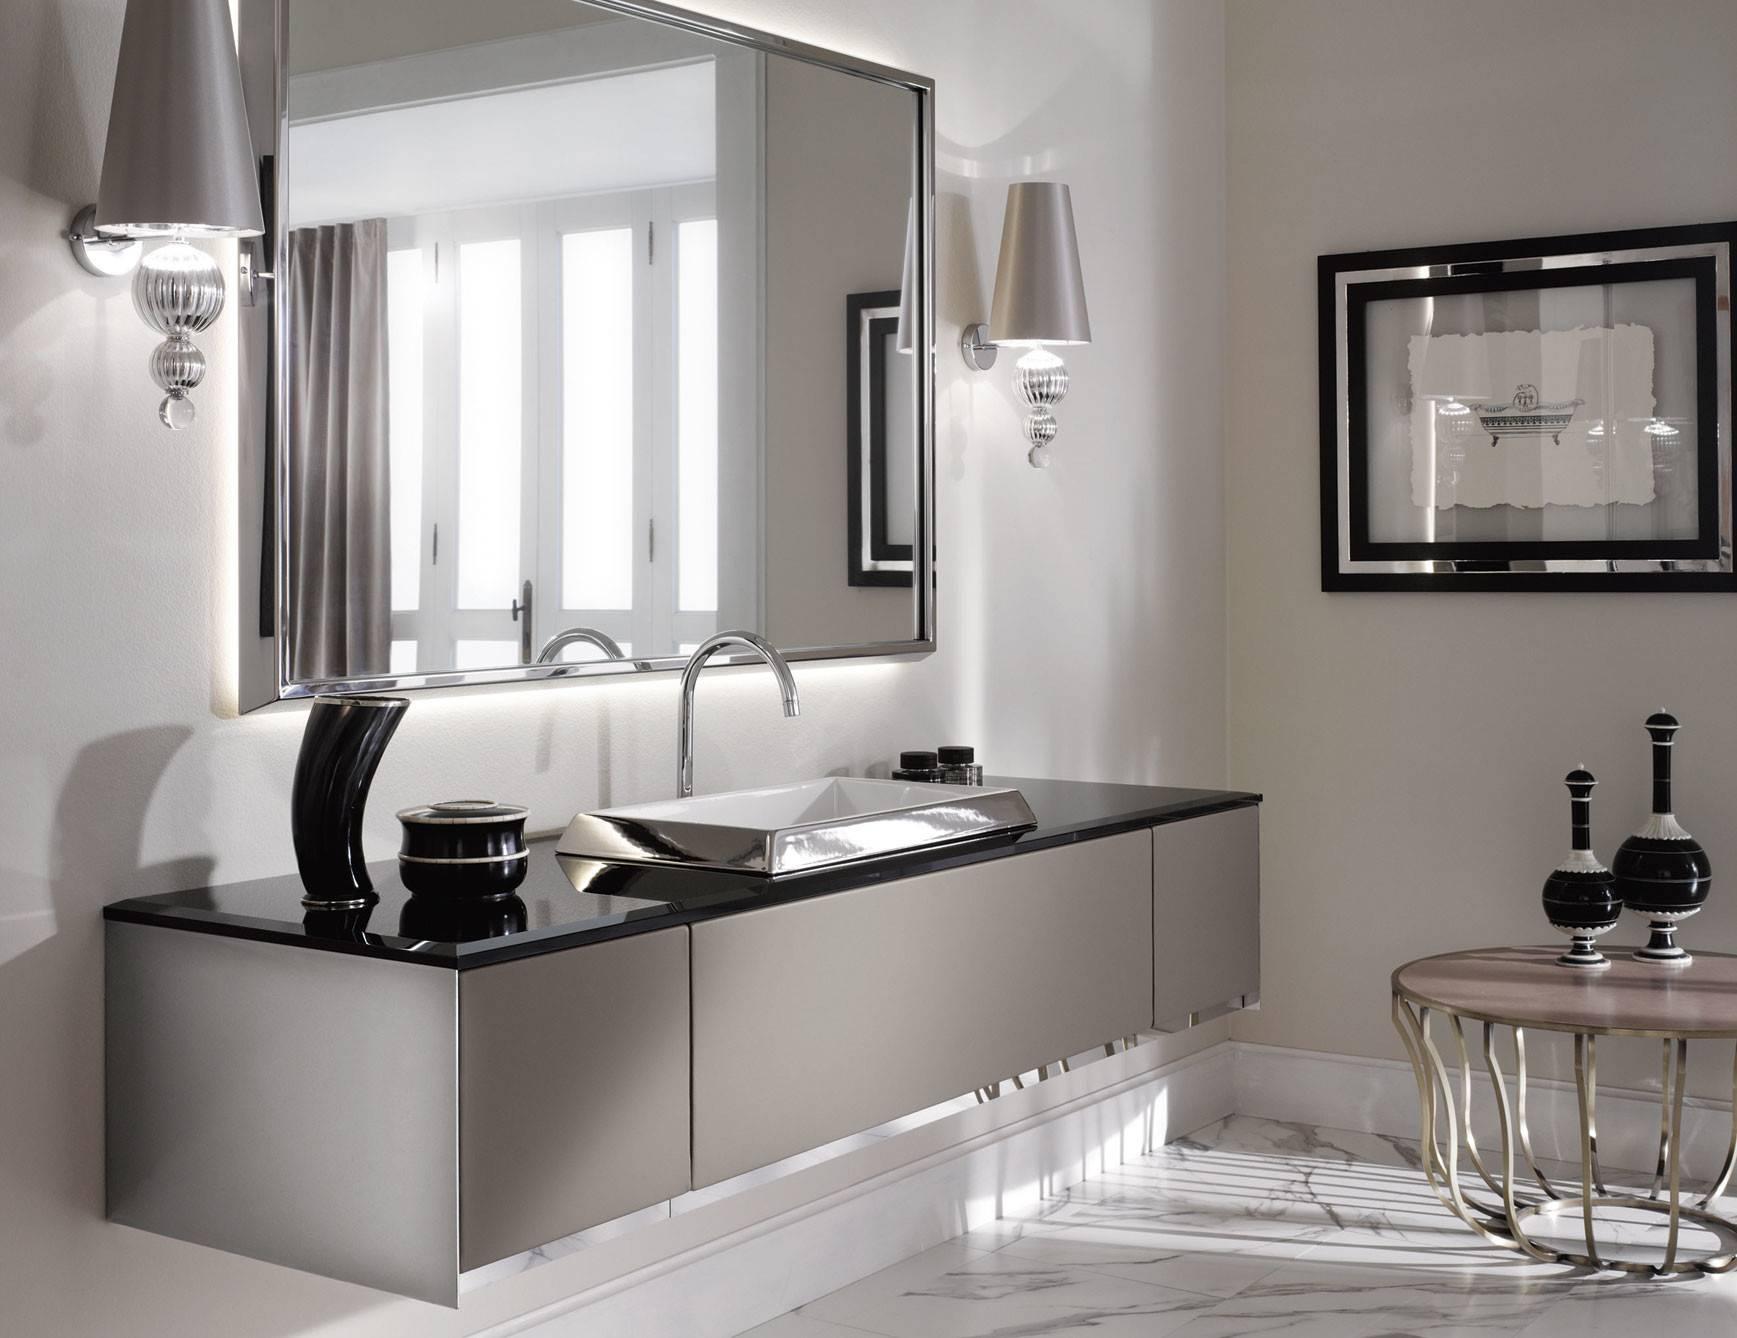 Luxury Bathroom Vanity Nella Vetrina